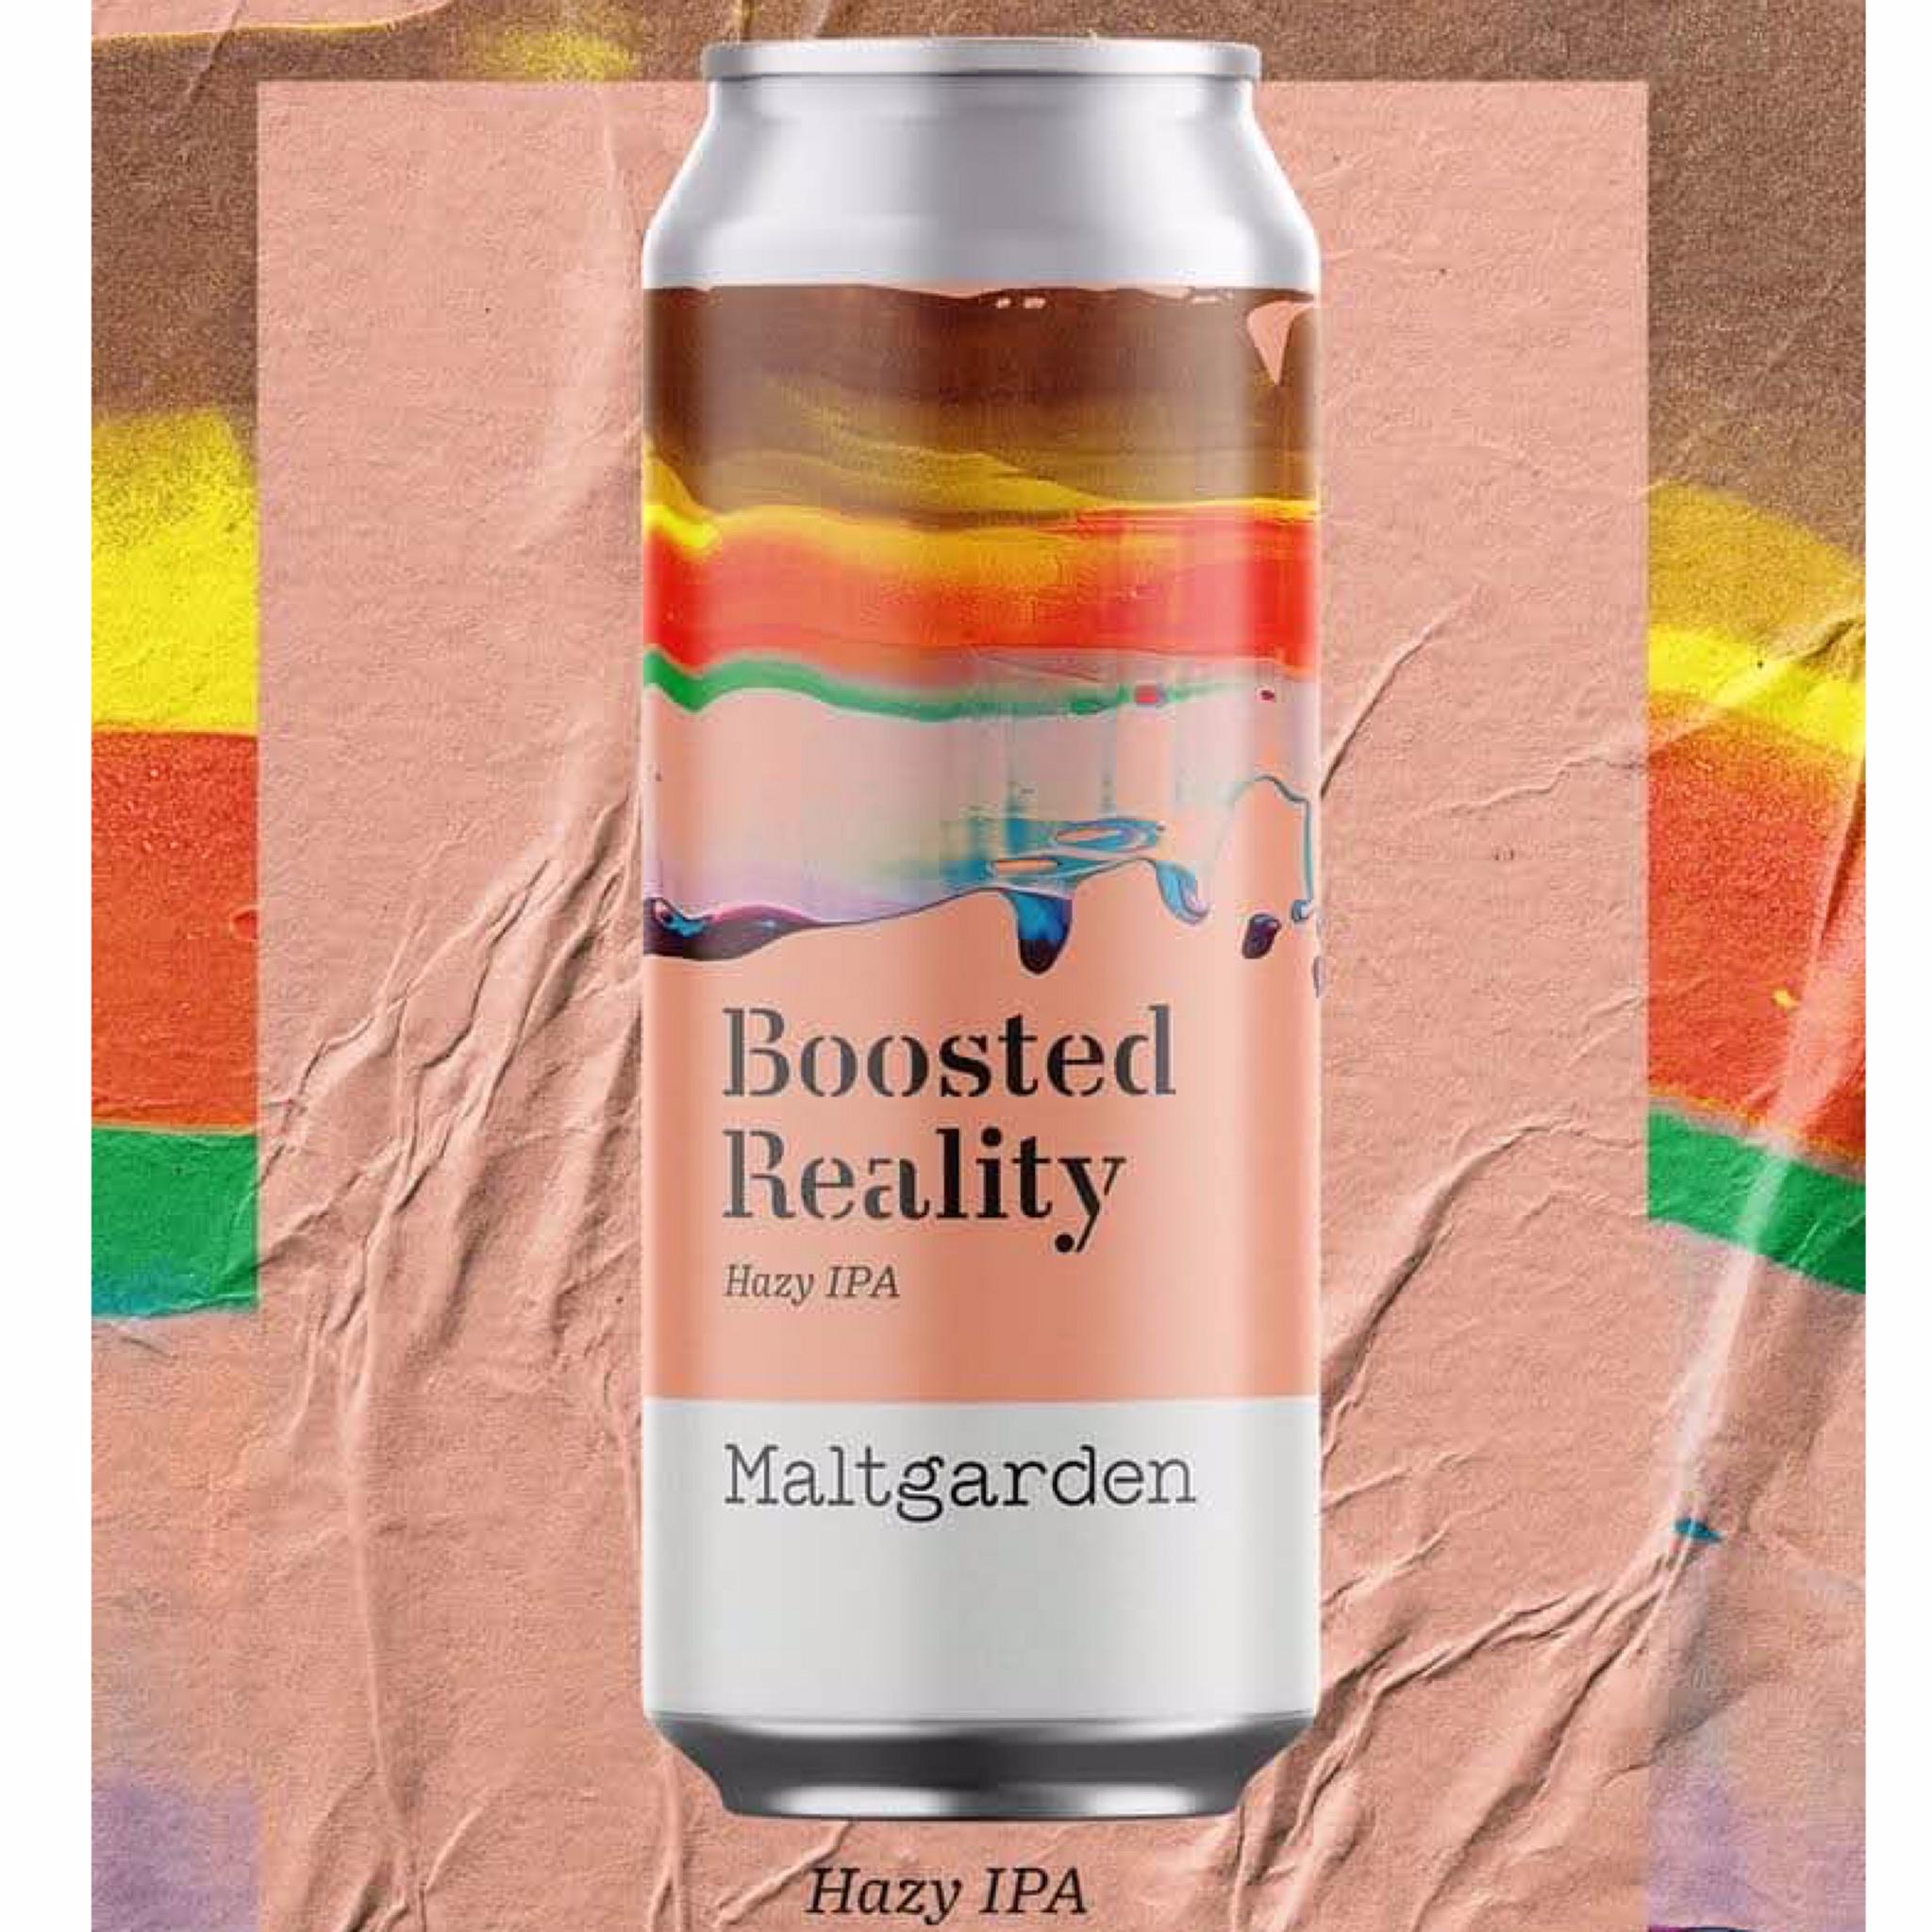 Boosted Reality Hazy IPA 5.3% 500ml Maltgarden Browar